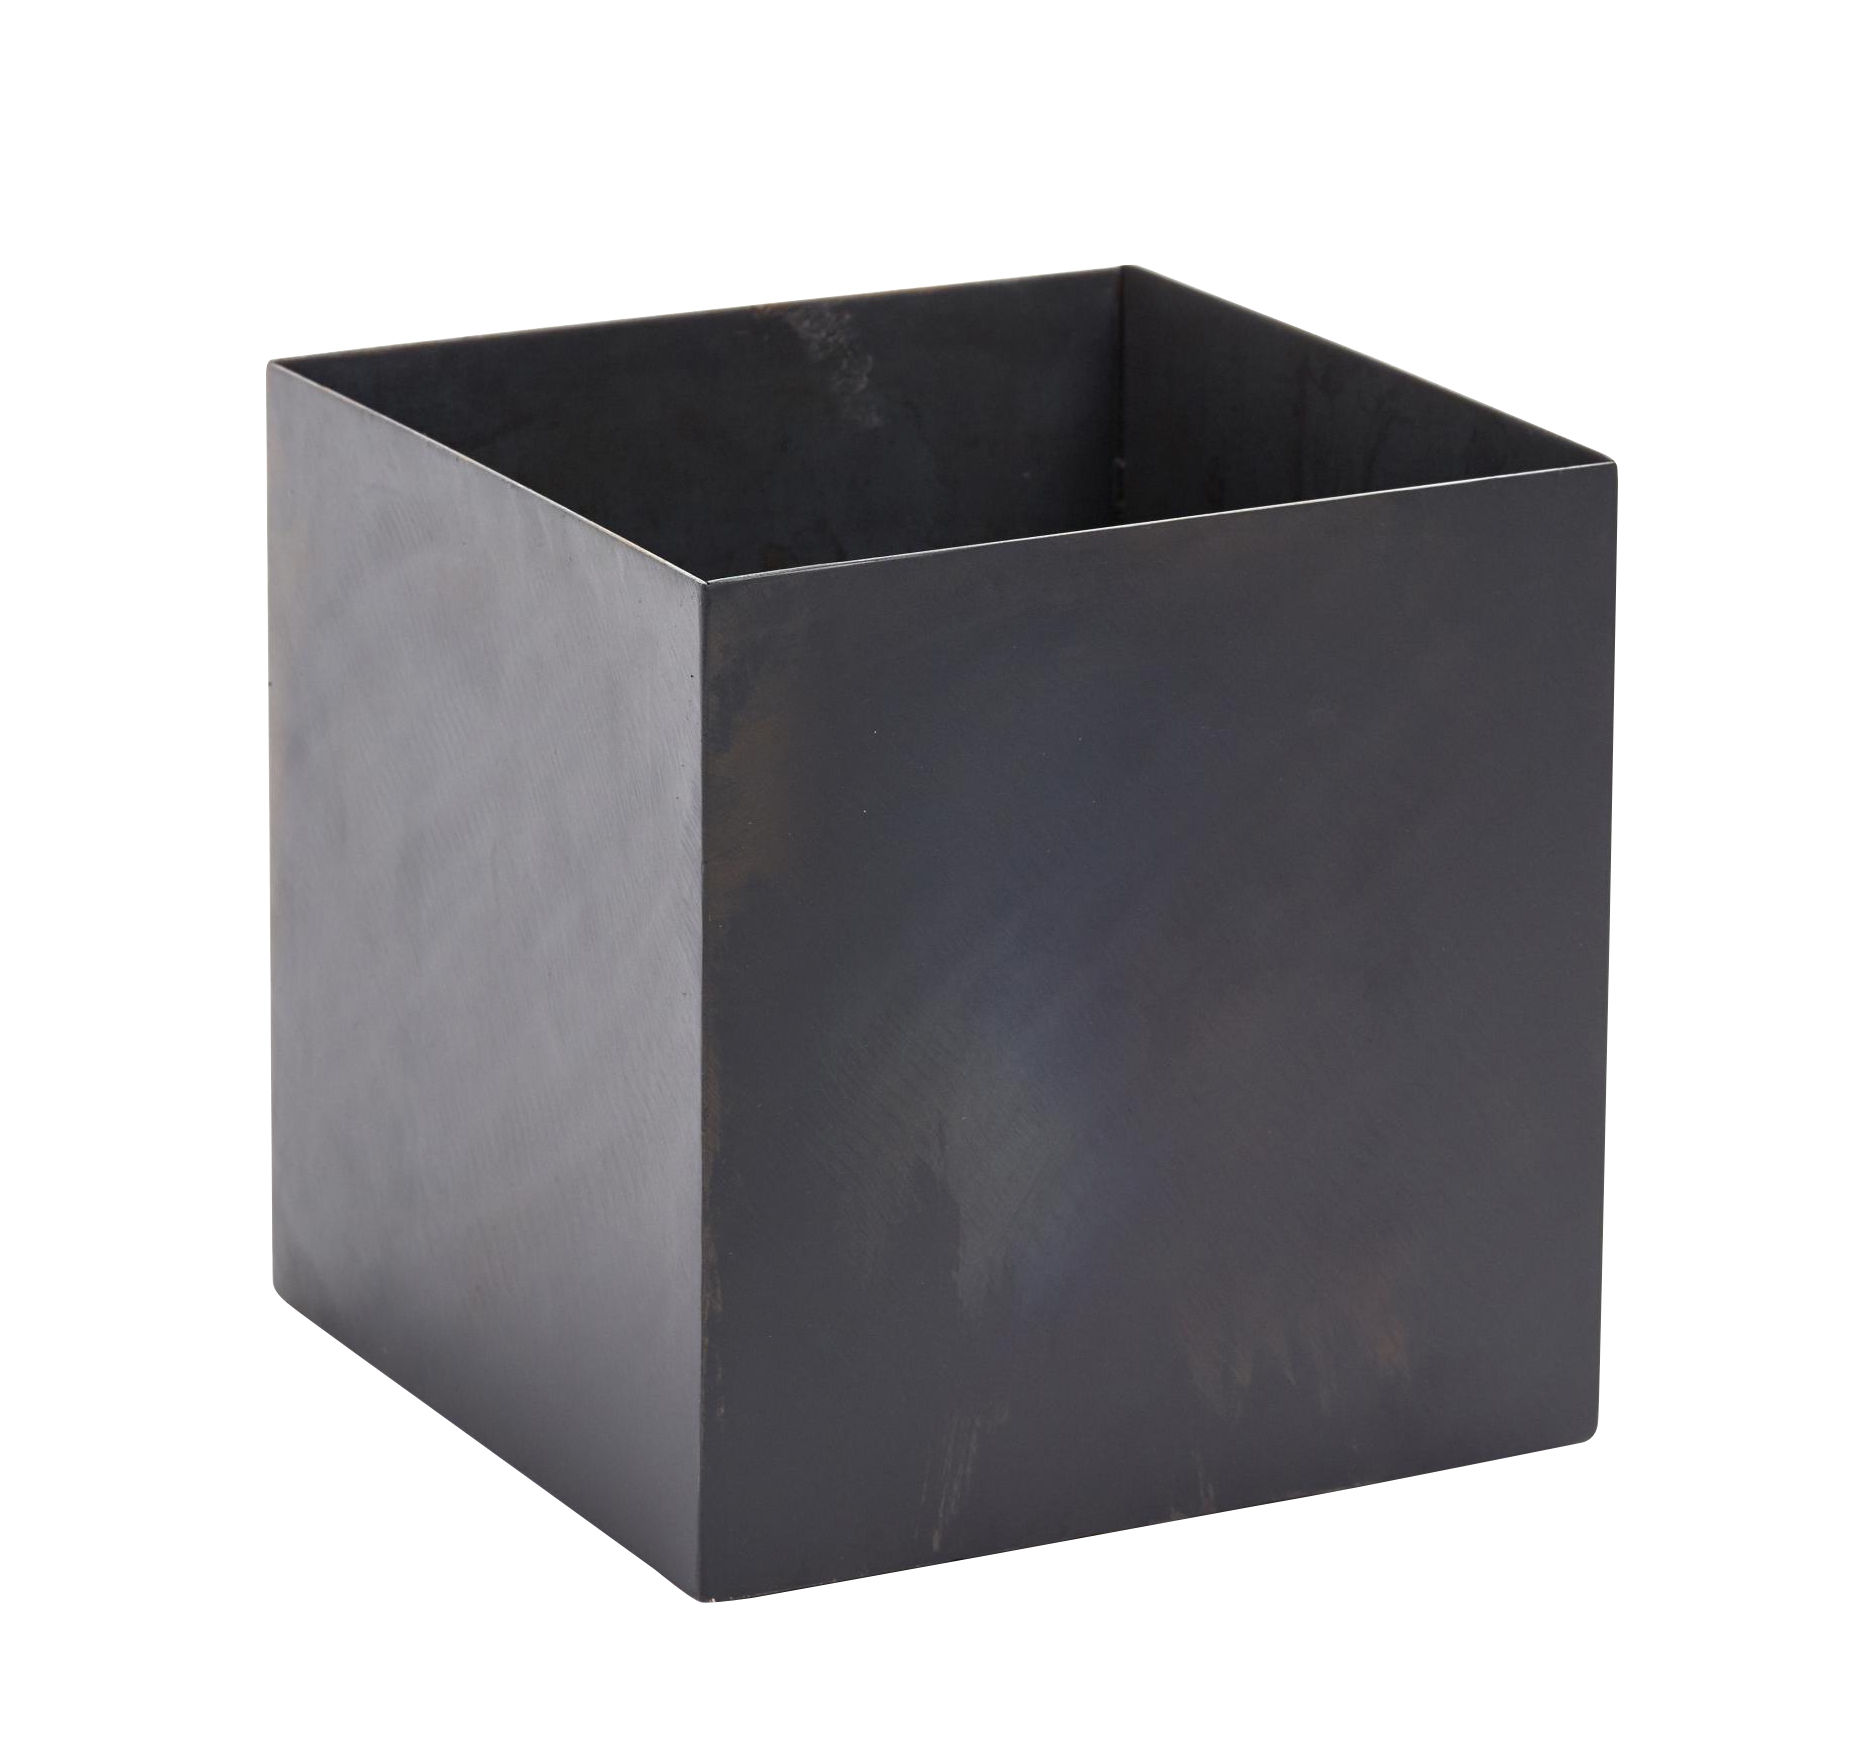 Decoration - Flower Pots & House Plants - Iron Pot - / 20 x 20 cm - Metal by Serax - Black - Lacquered metal